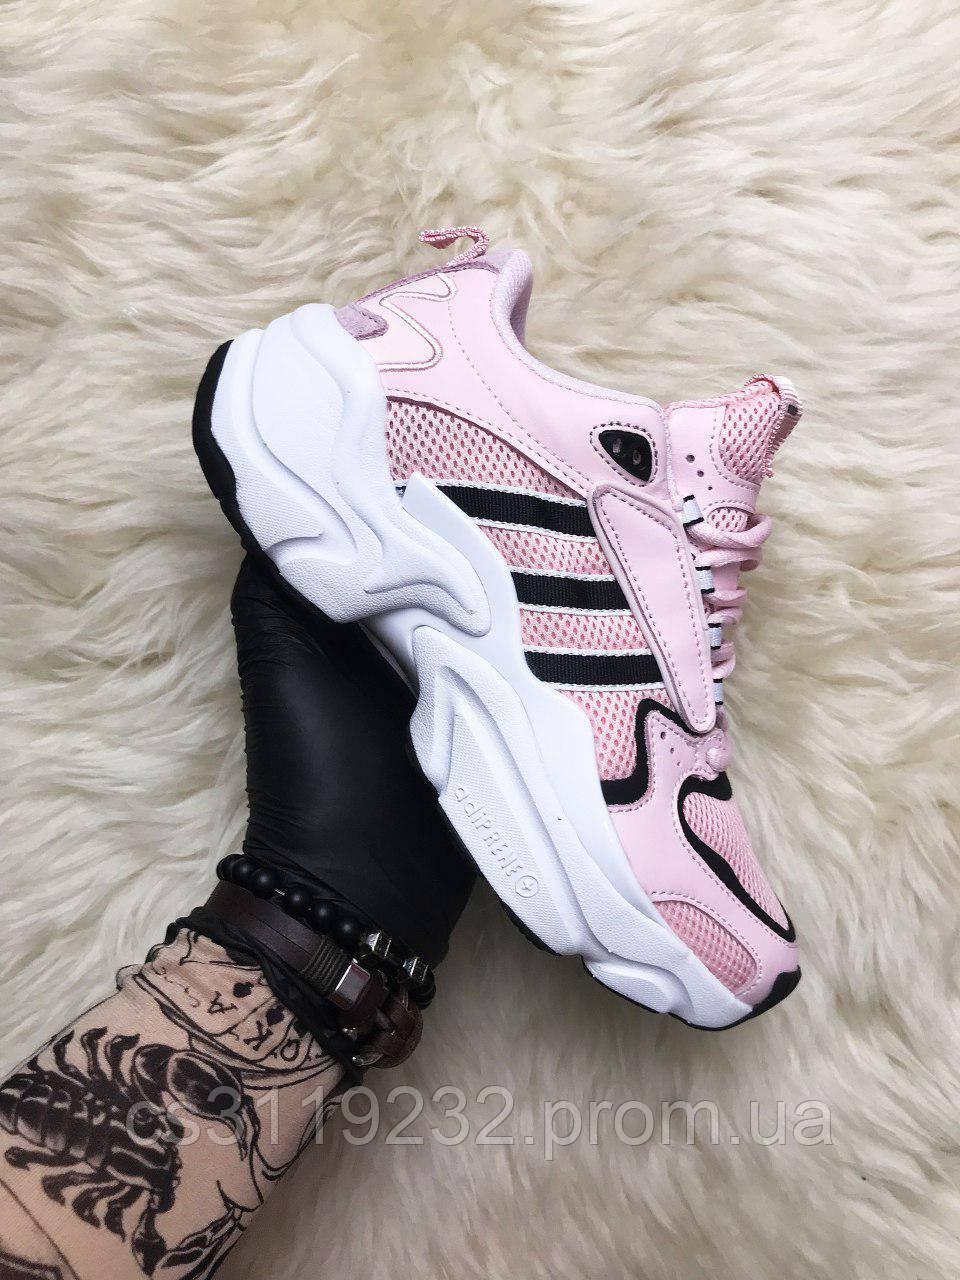 Женские кроссовки Adidas Naked Magmur Runner Pink (розовые)